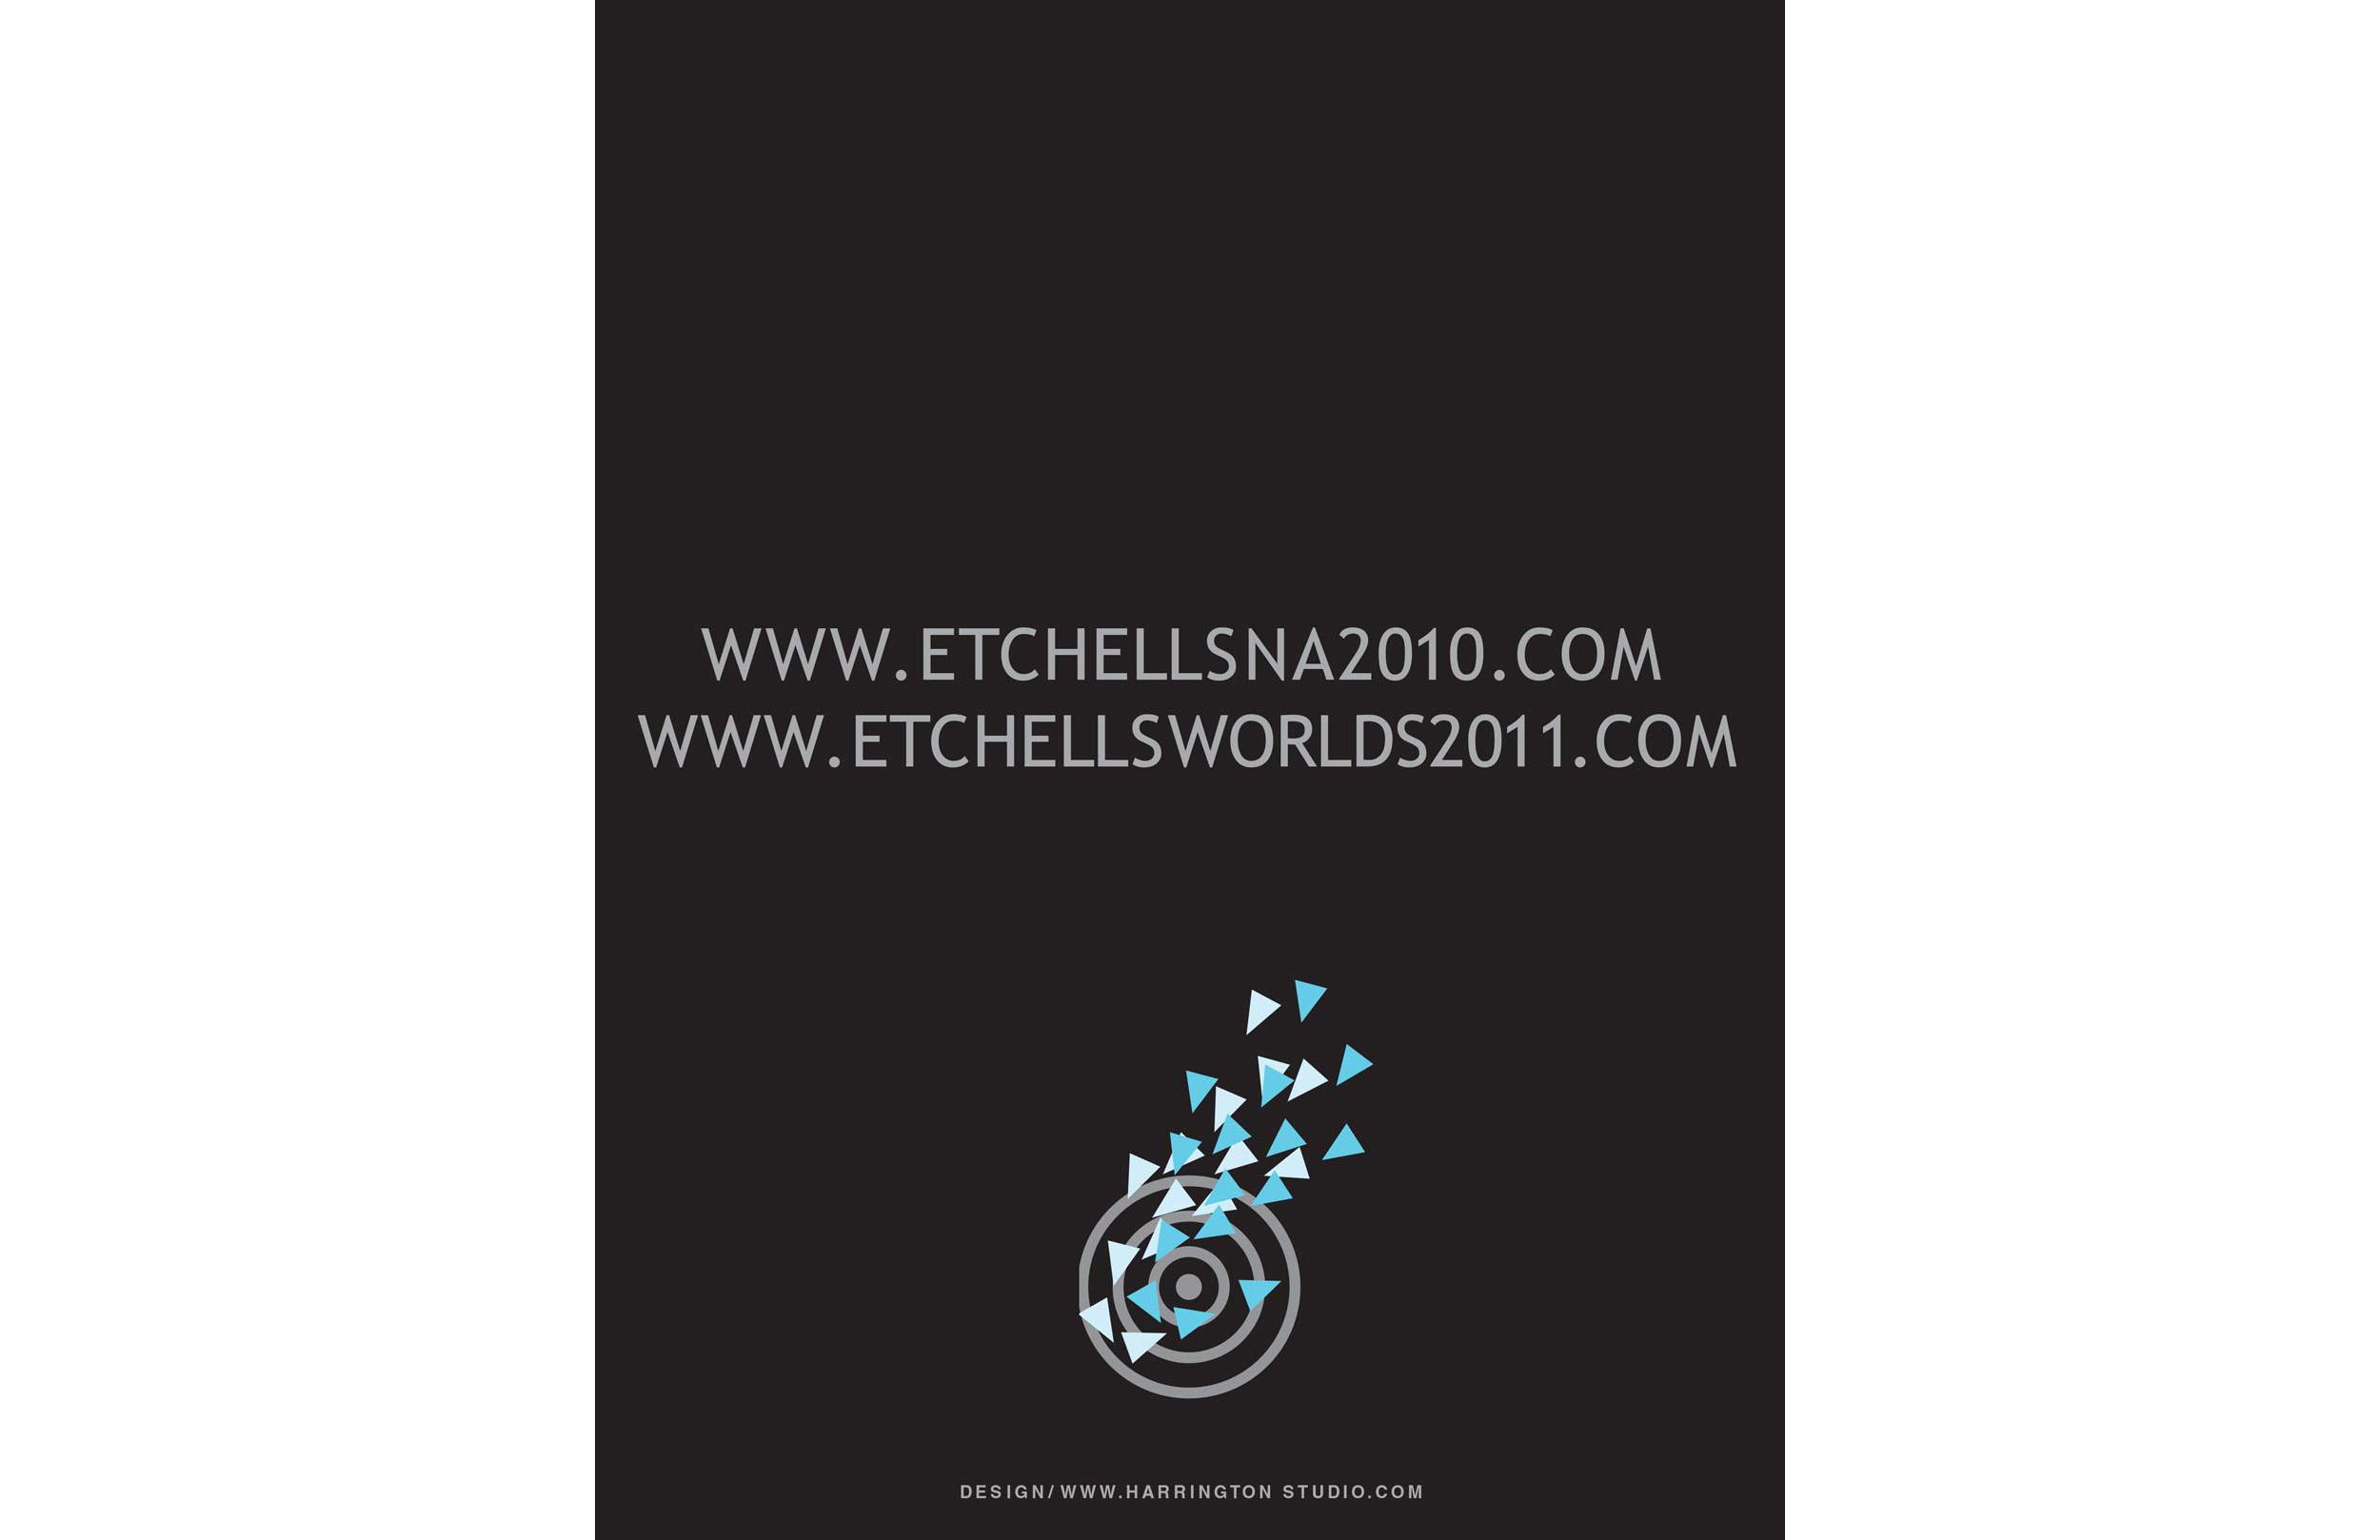 etchellsGraphicGuide021611_portfolio-1_2500px2.jpg